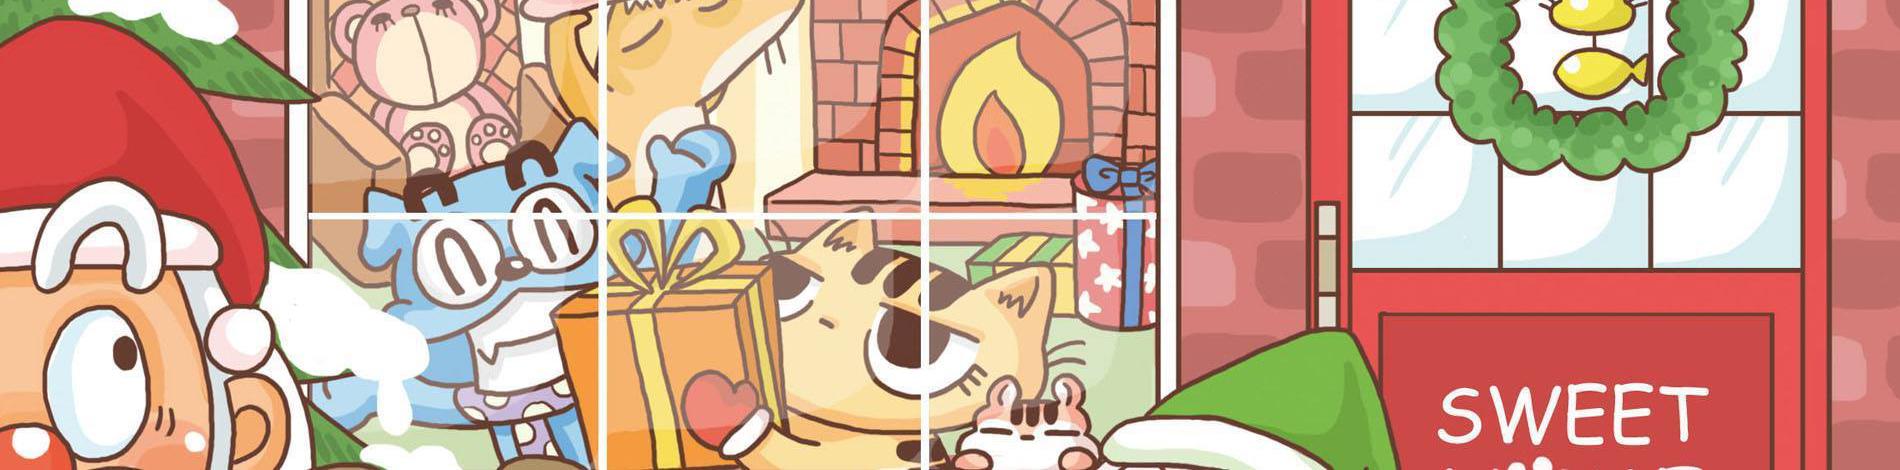 DESSERT365, 找手工甜甜網, 漫漫手工客製化市集, PrinXure, 拍洗社, 插畫家, 插畫角色, PrinXure, 不屑貓